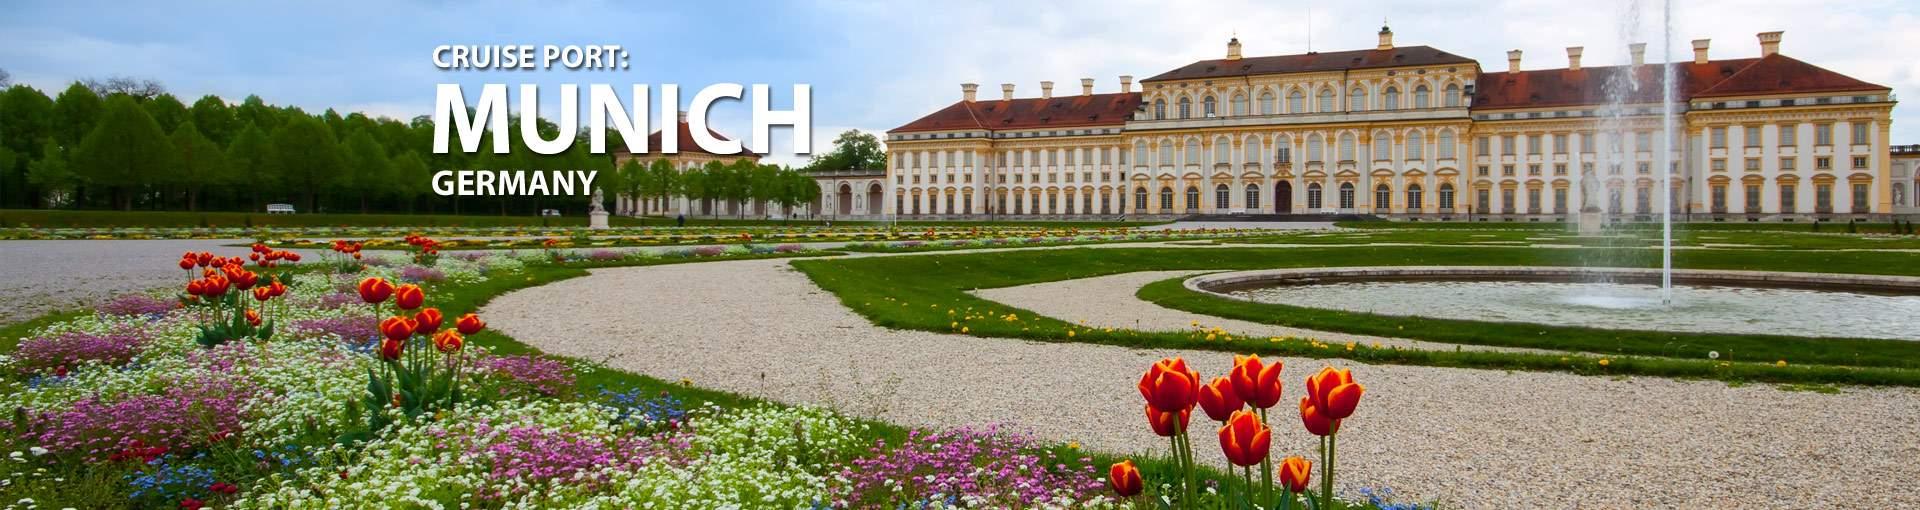 Cruises from Munich, Germany